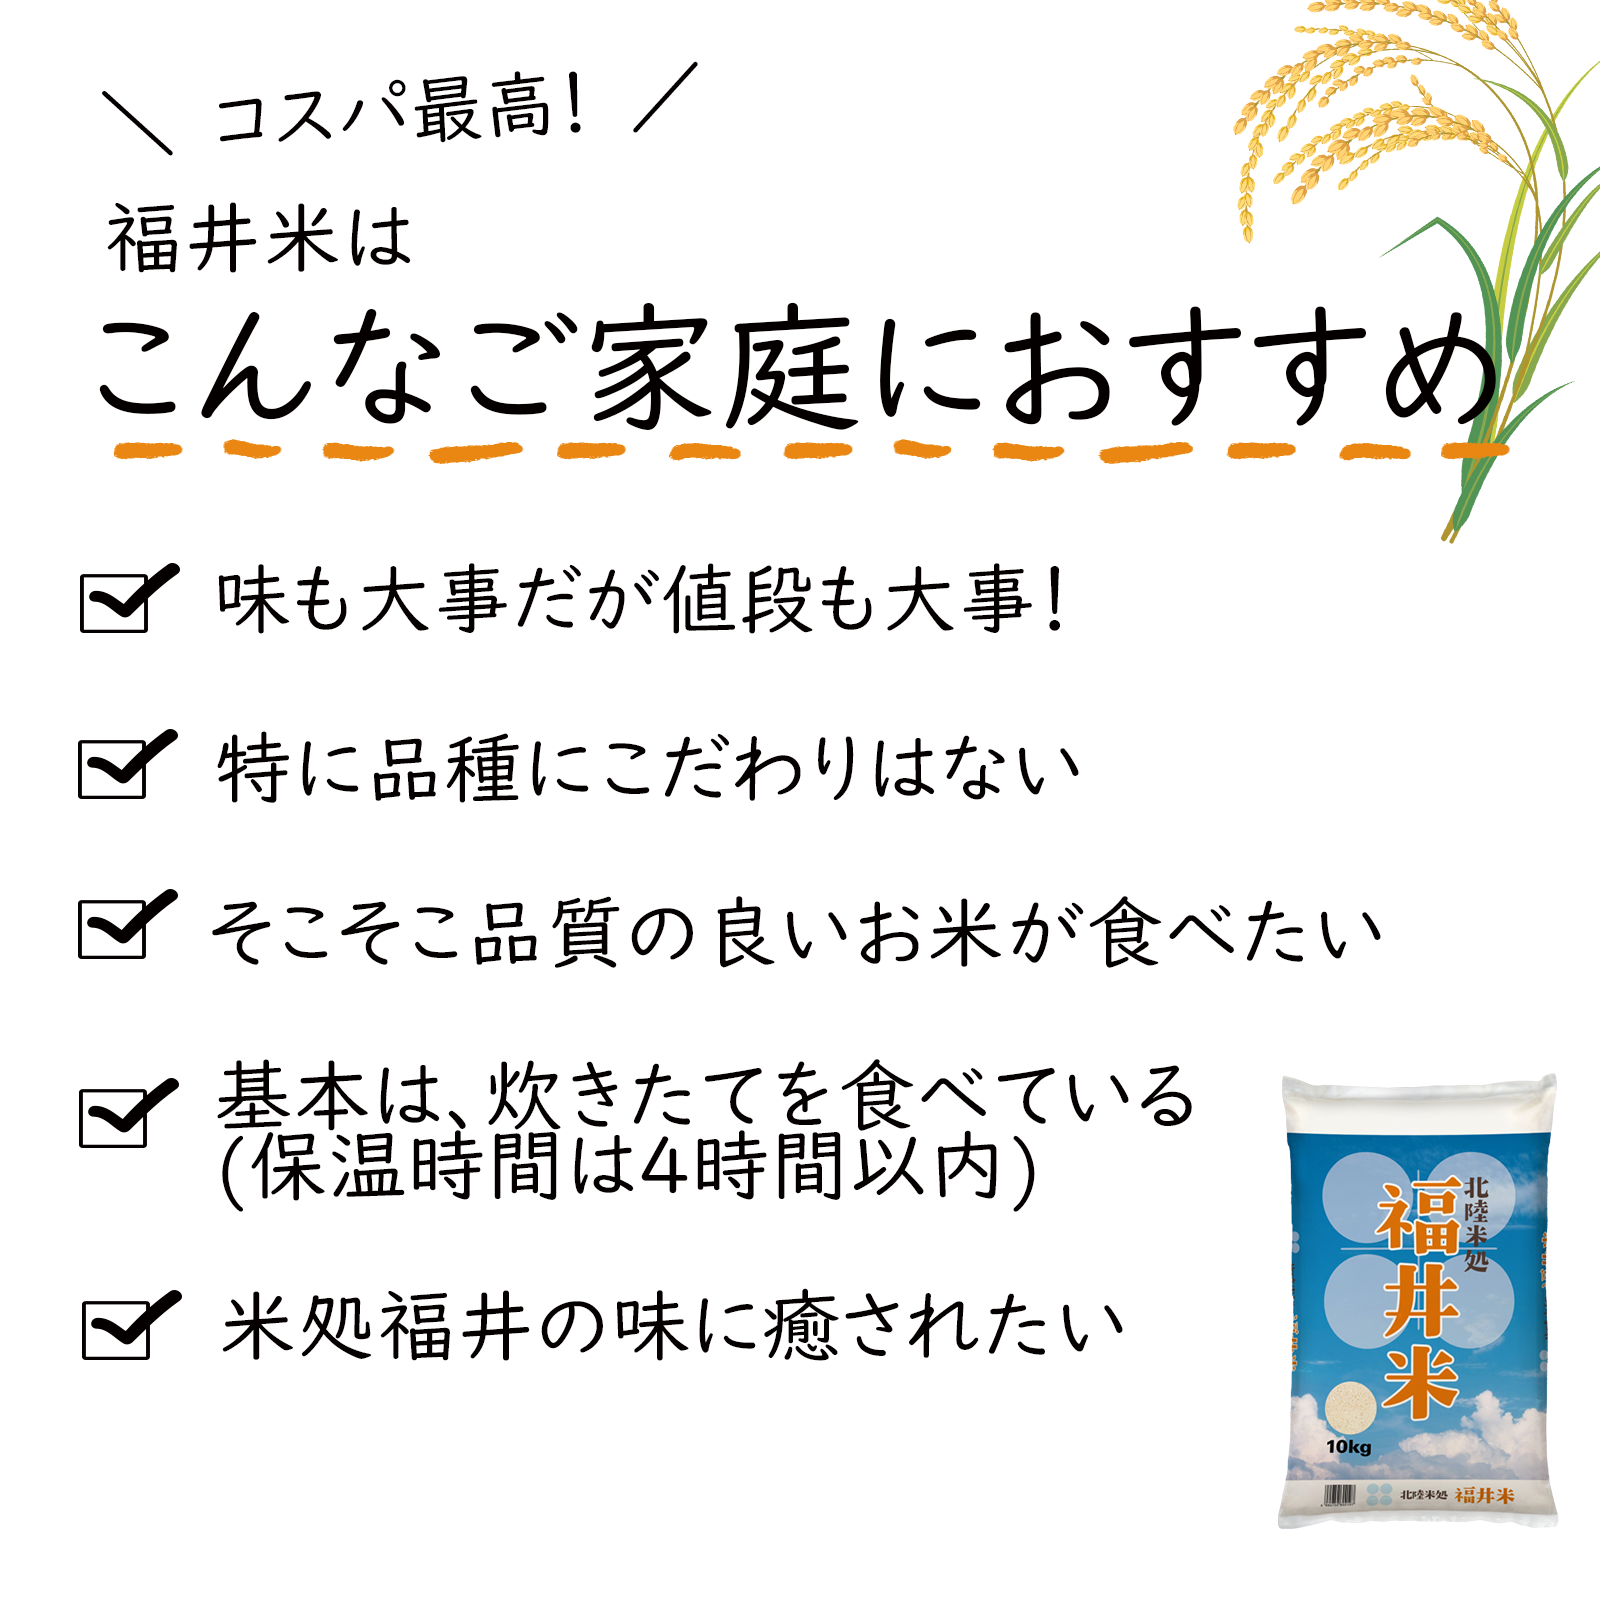 福井米 白米 24kg(8kg×3) 福井県産米100%ブレンド米